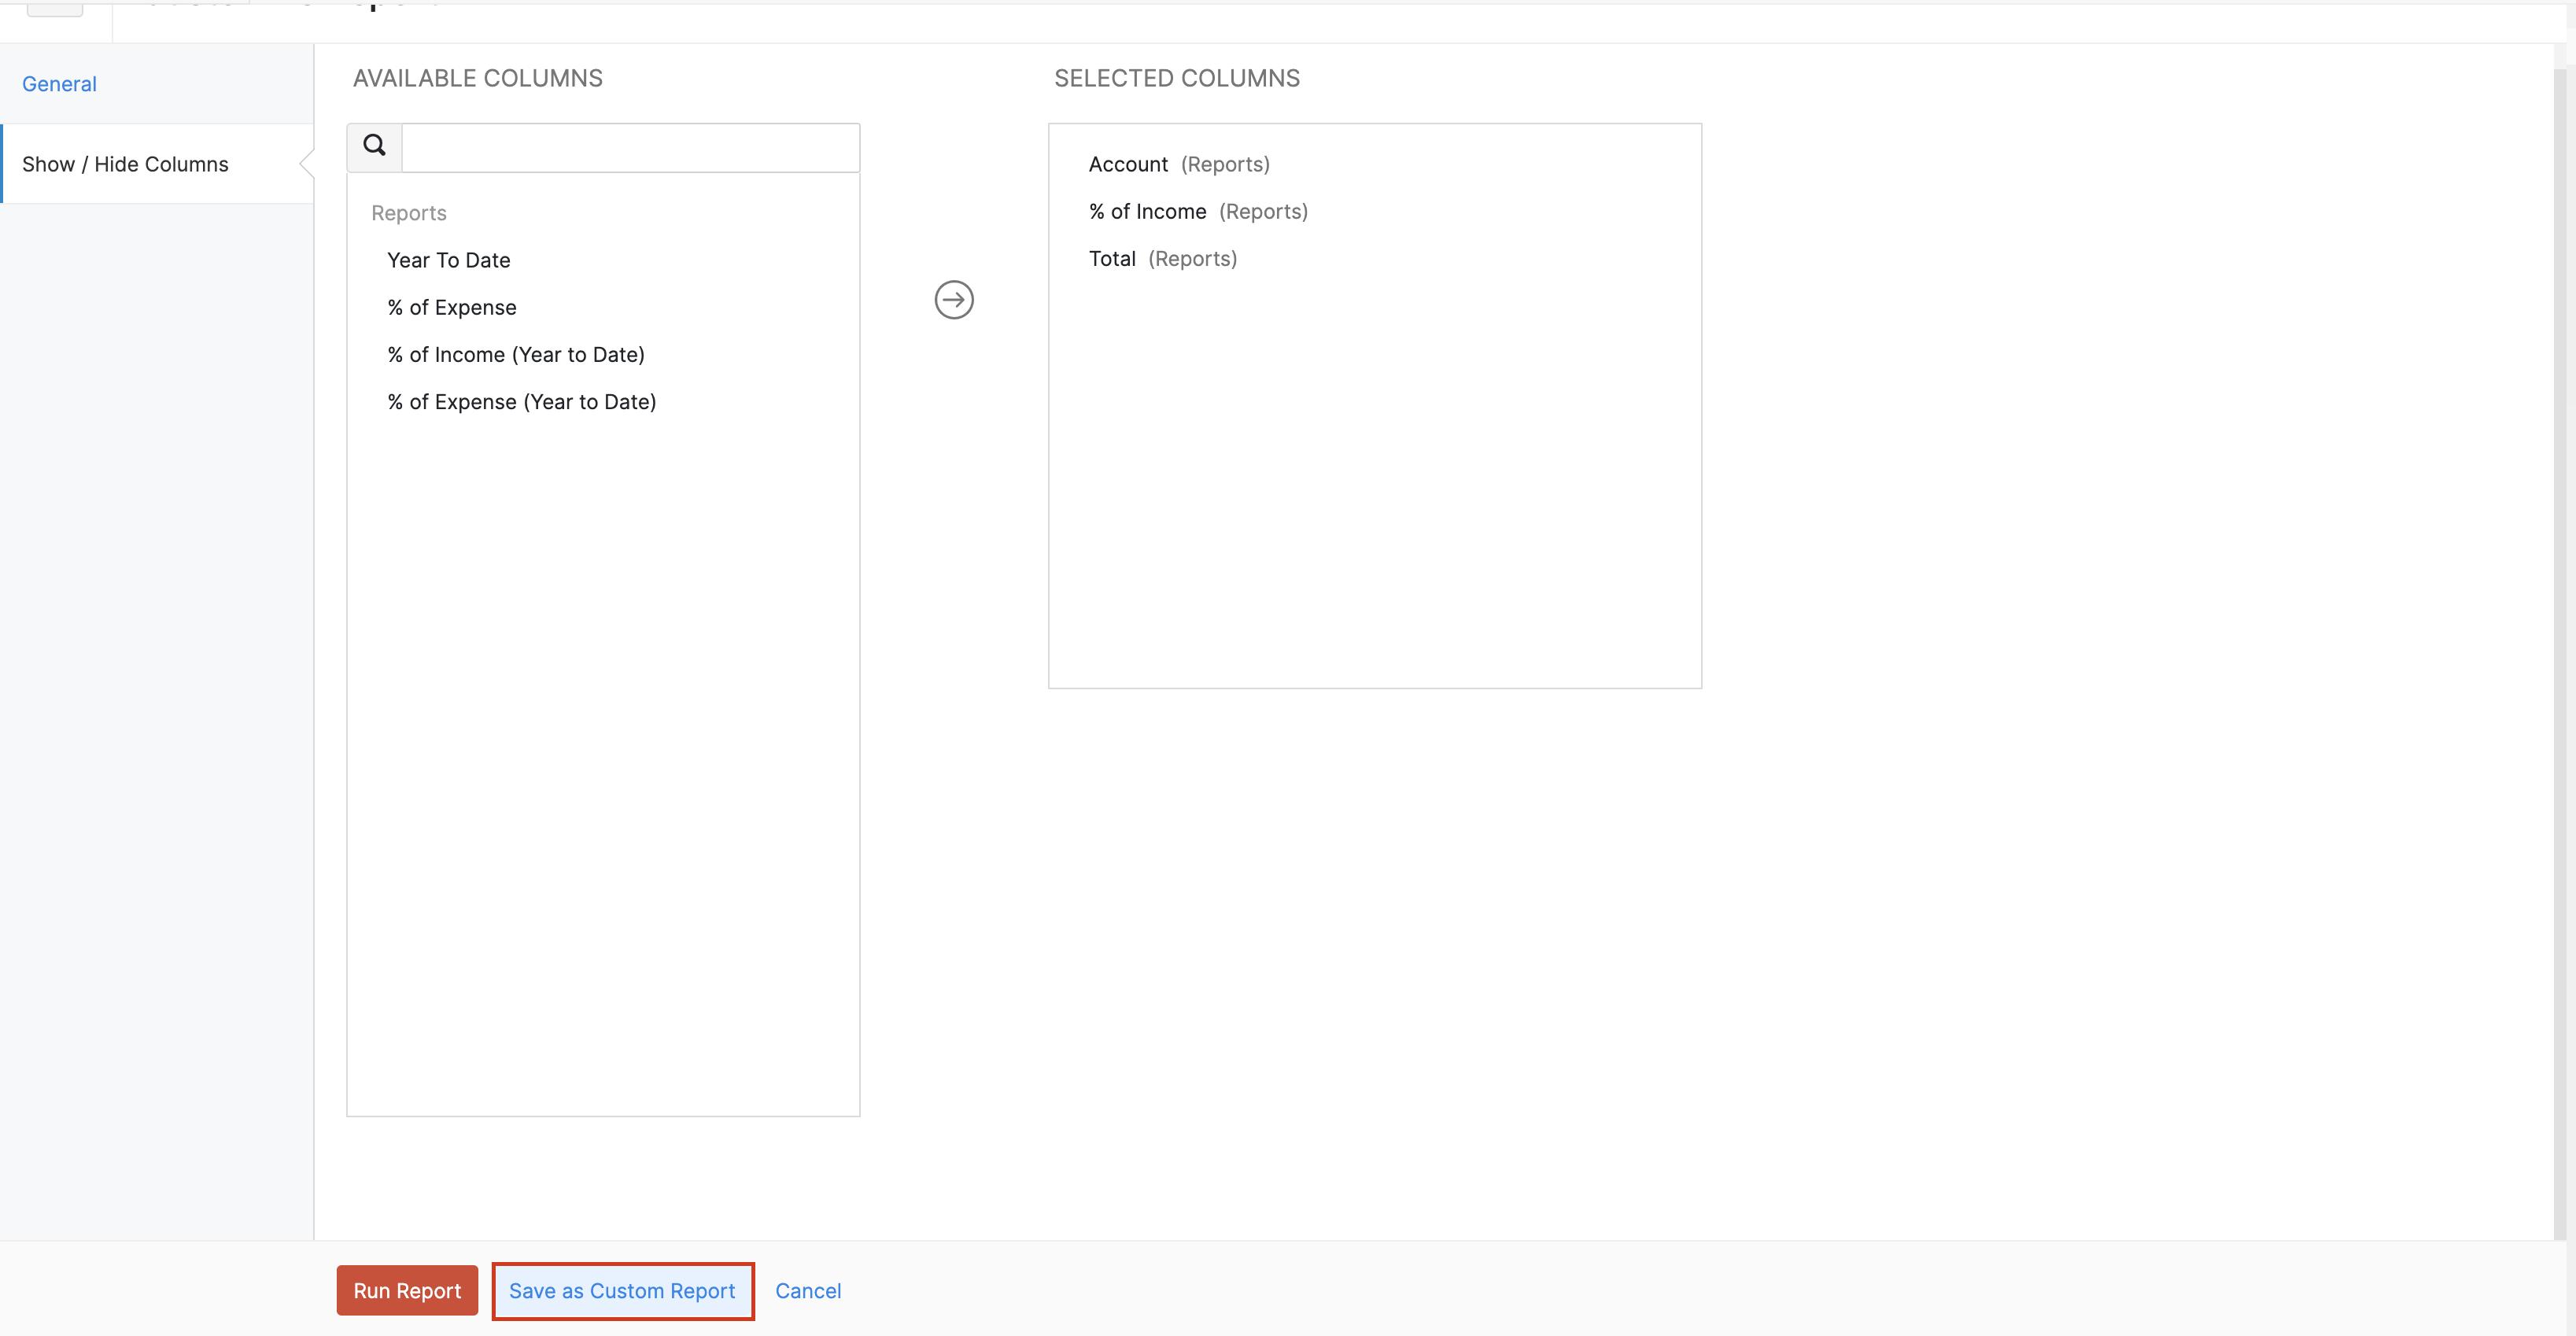 Save as custom report